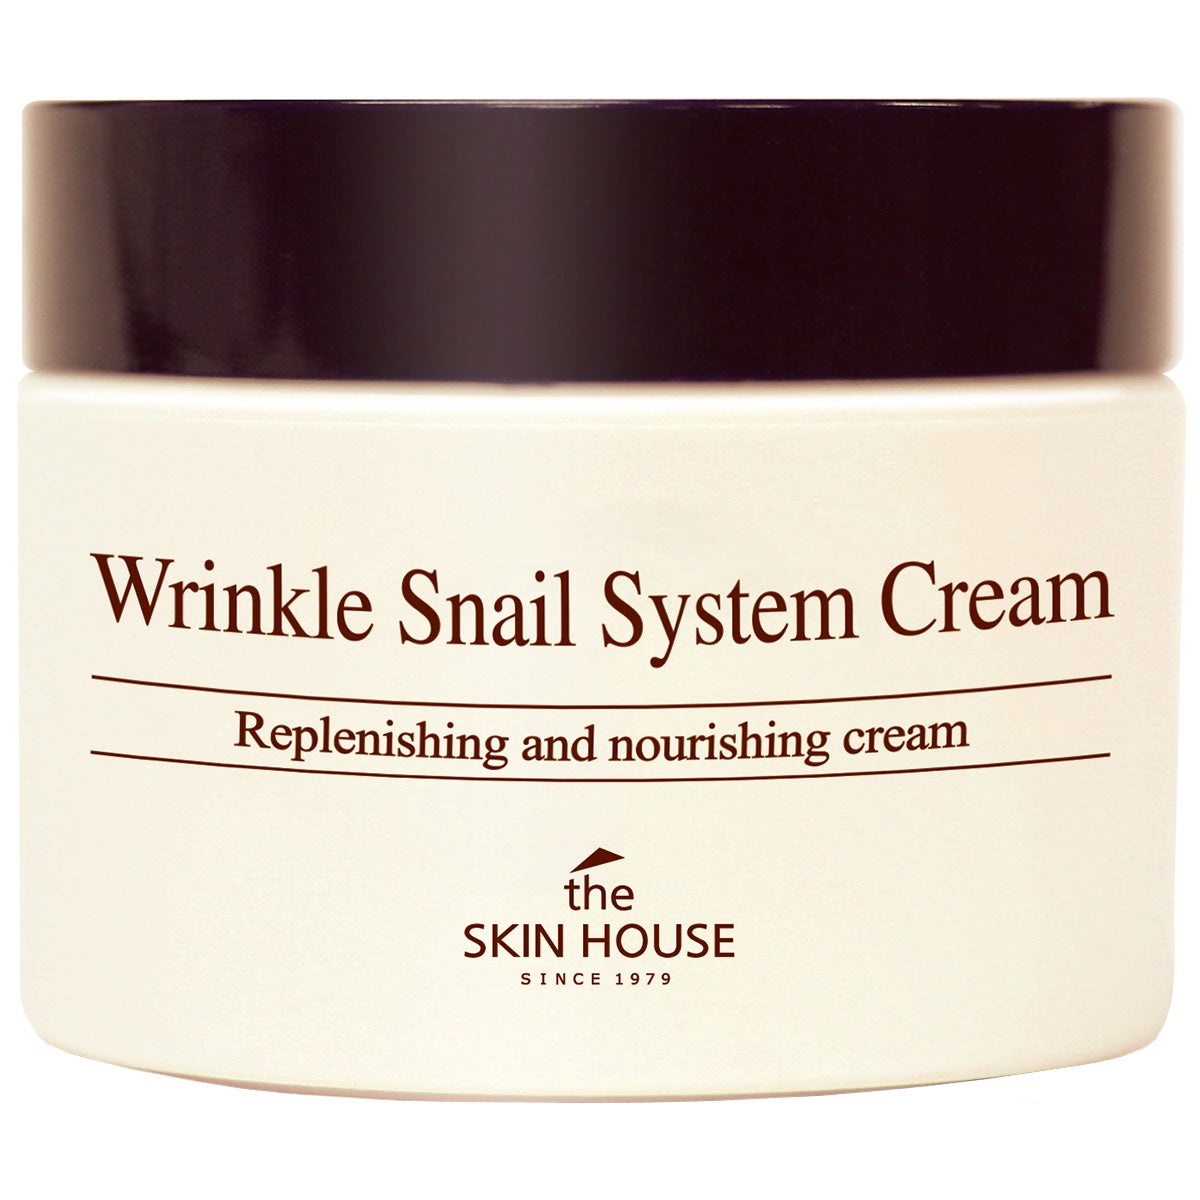 Wrinkle Snail System Cream 100 ml The Skin House K-Beauty